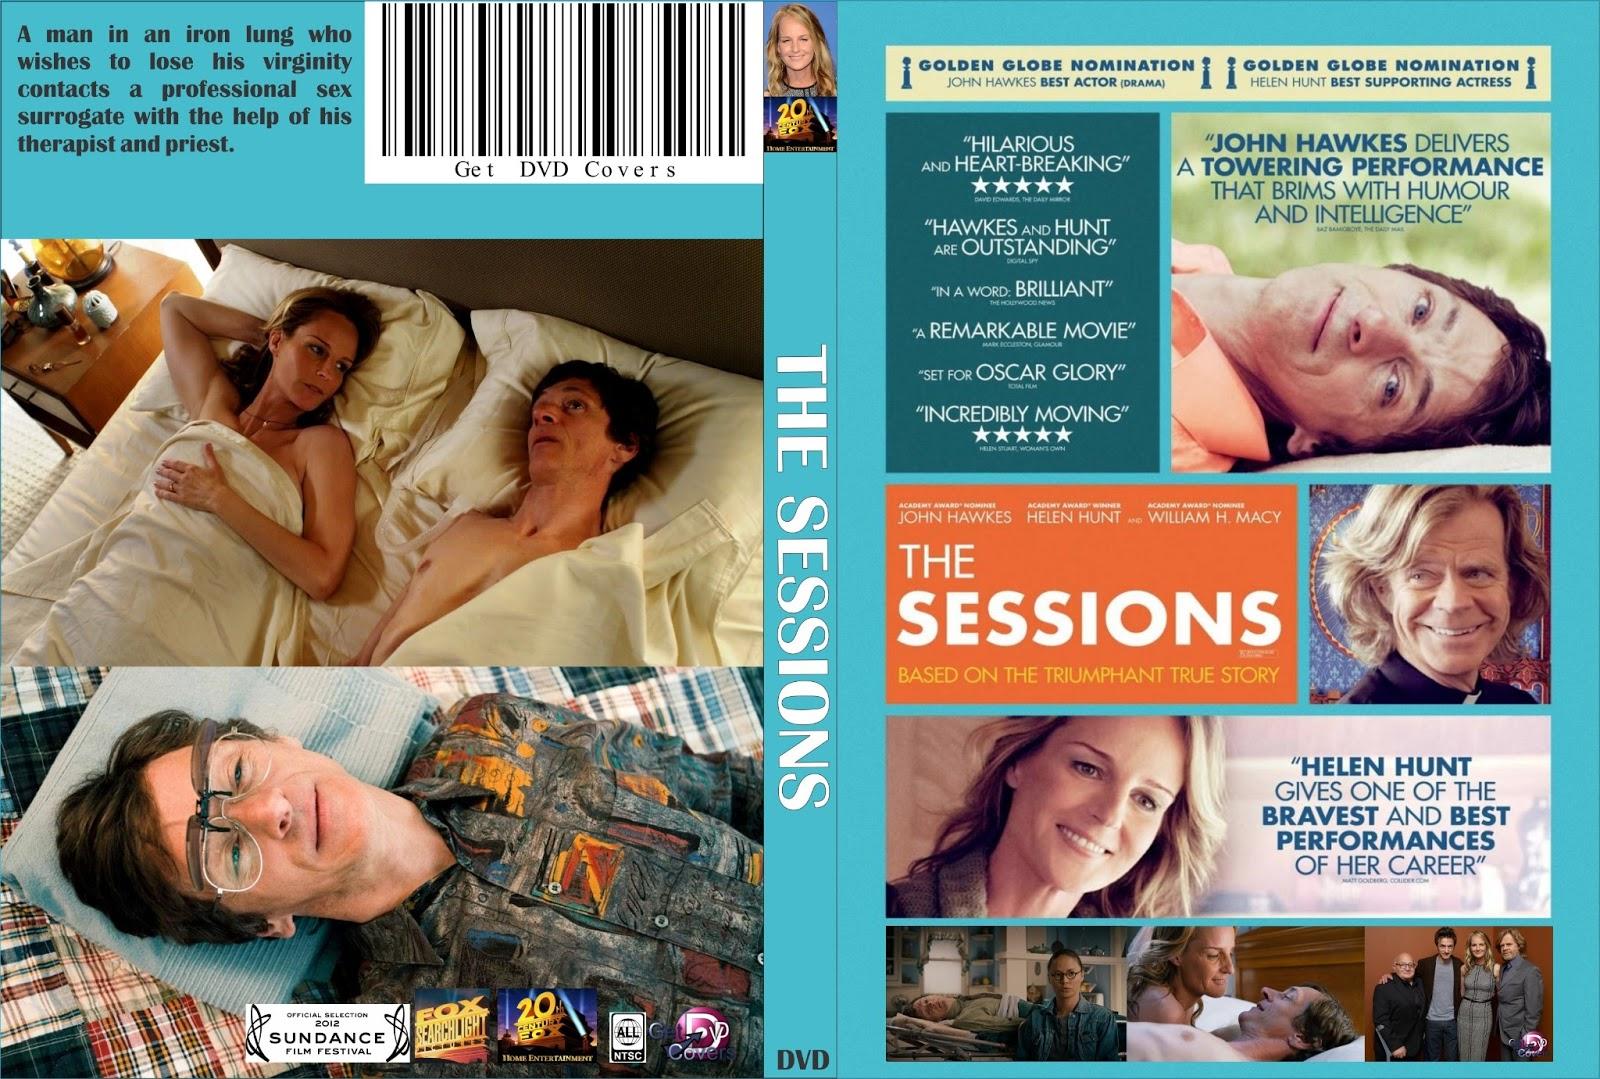 http://3.bp.blogspot.com/-qucEp4kobr0/UVxlitZjIpI/AAAAAAAAMtk/s-tCJxw13Ro/s1600/the-sessions-2012-r0-custom-front-www.getdvdcovers.com_.jpg